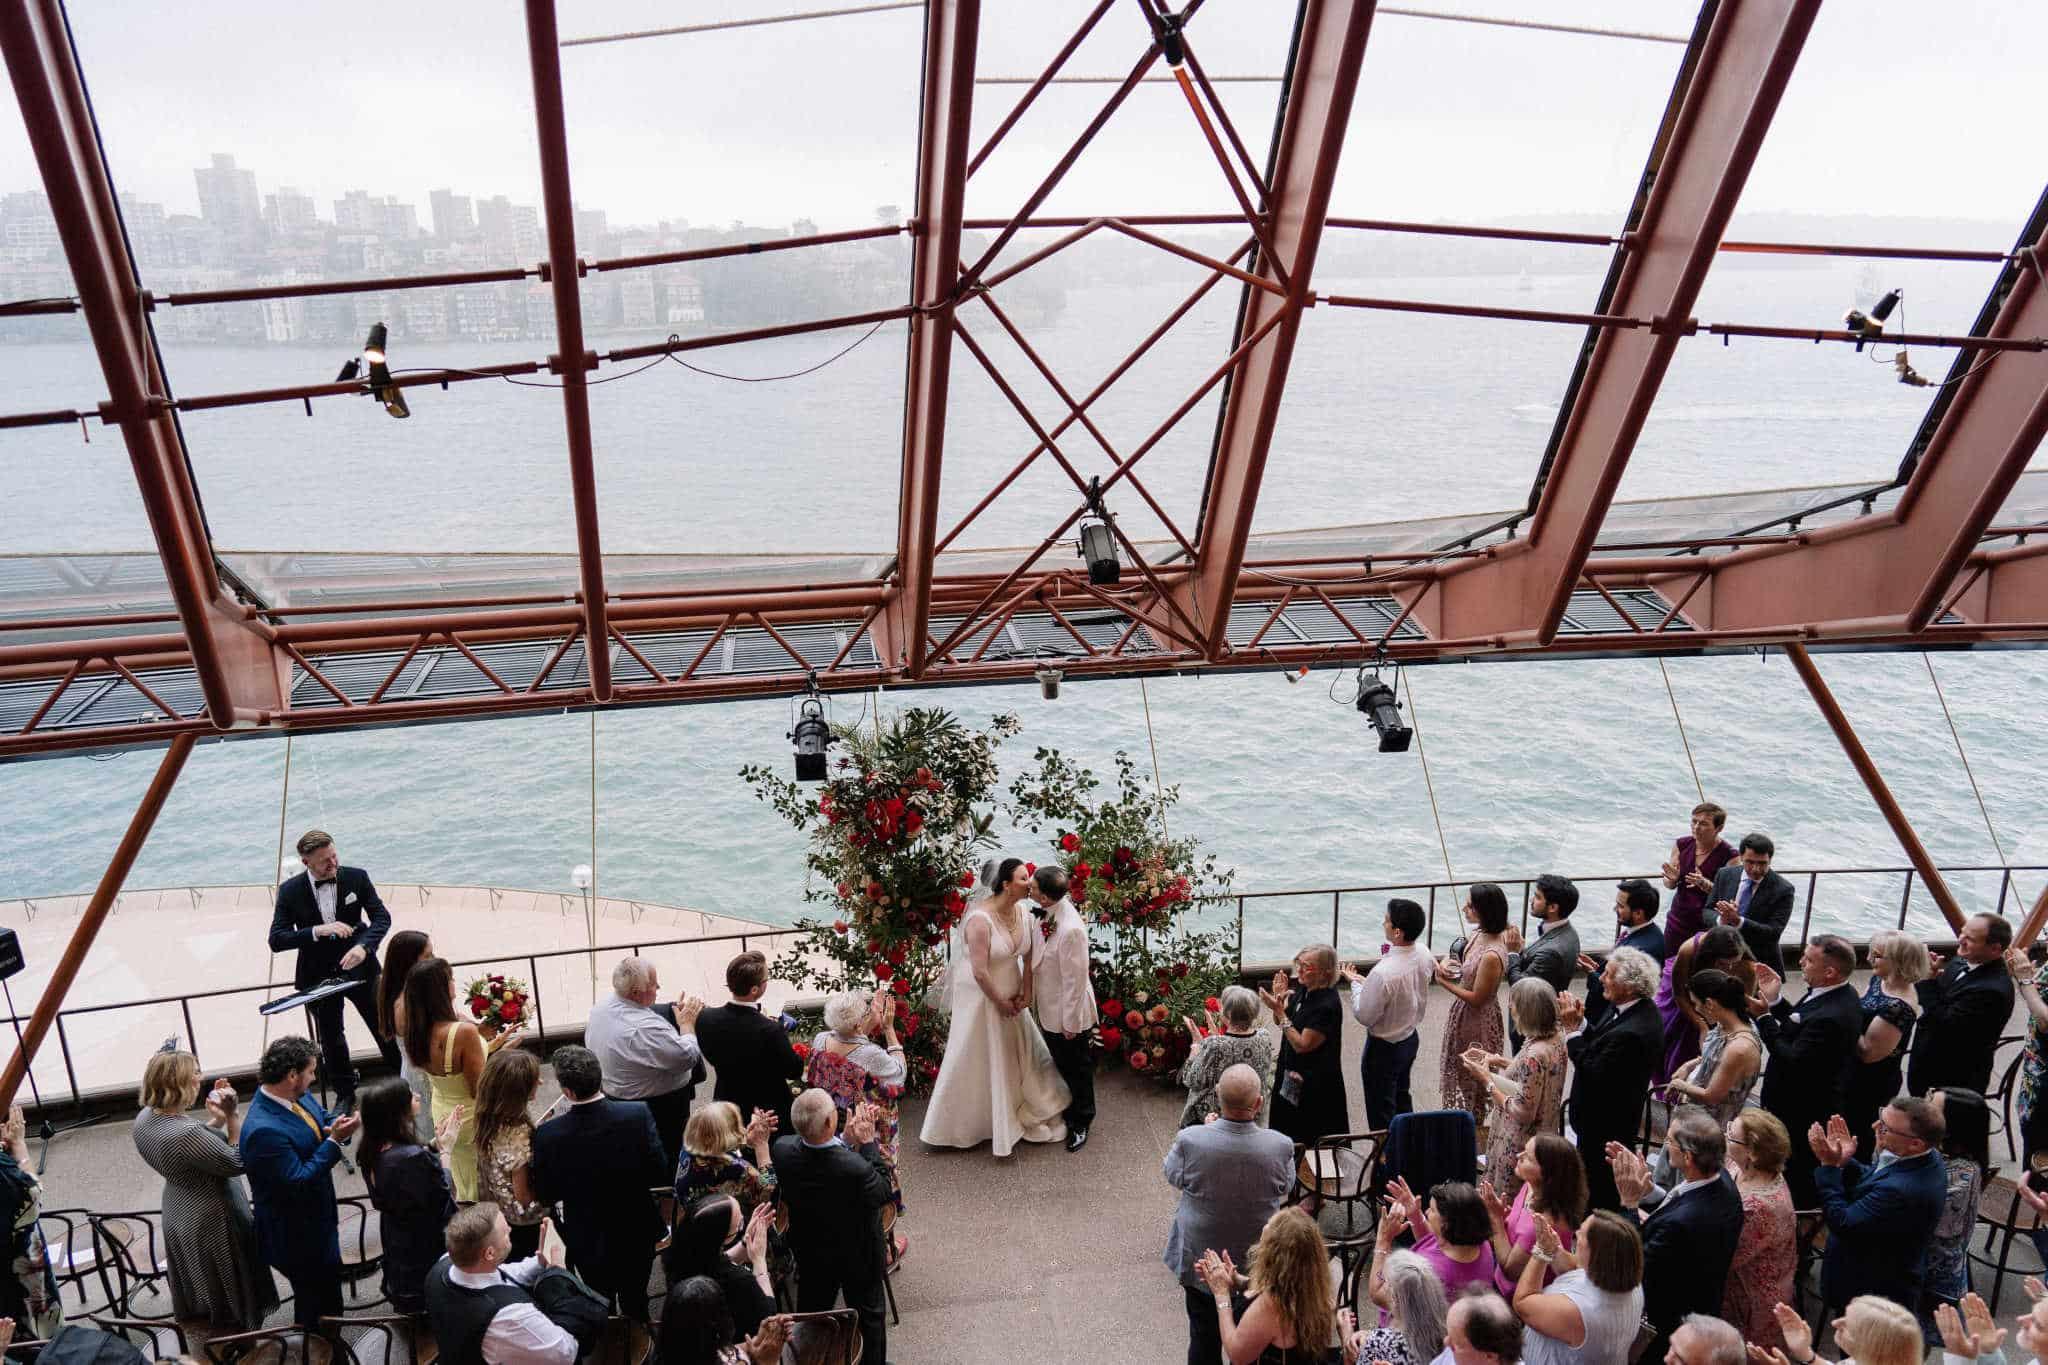 Sydney Opera House Wedding - Stephen Lee Marriage Celebrant Sydney